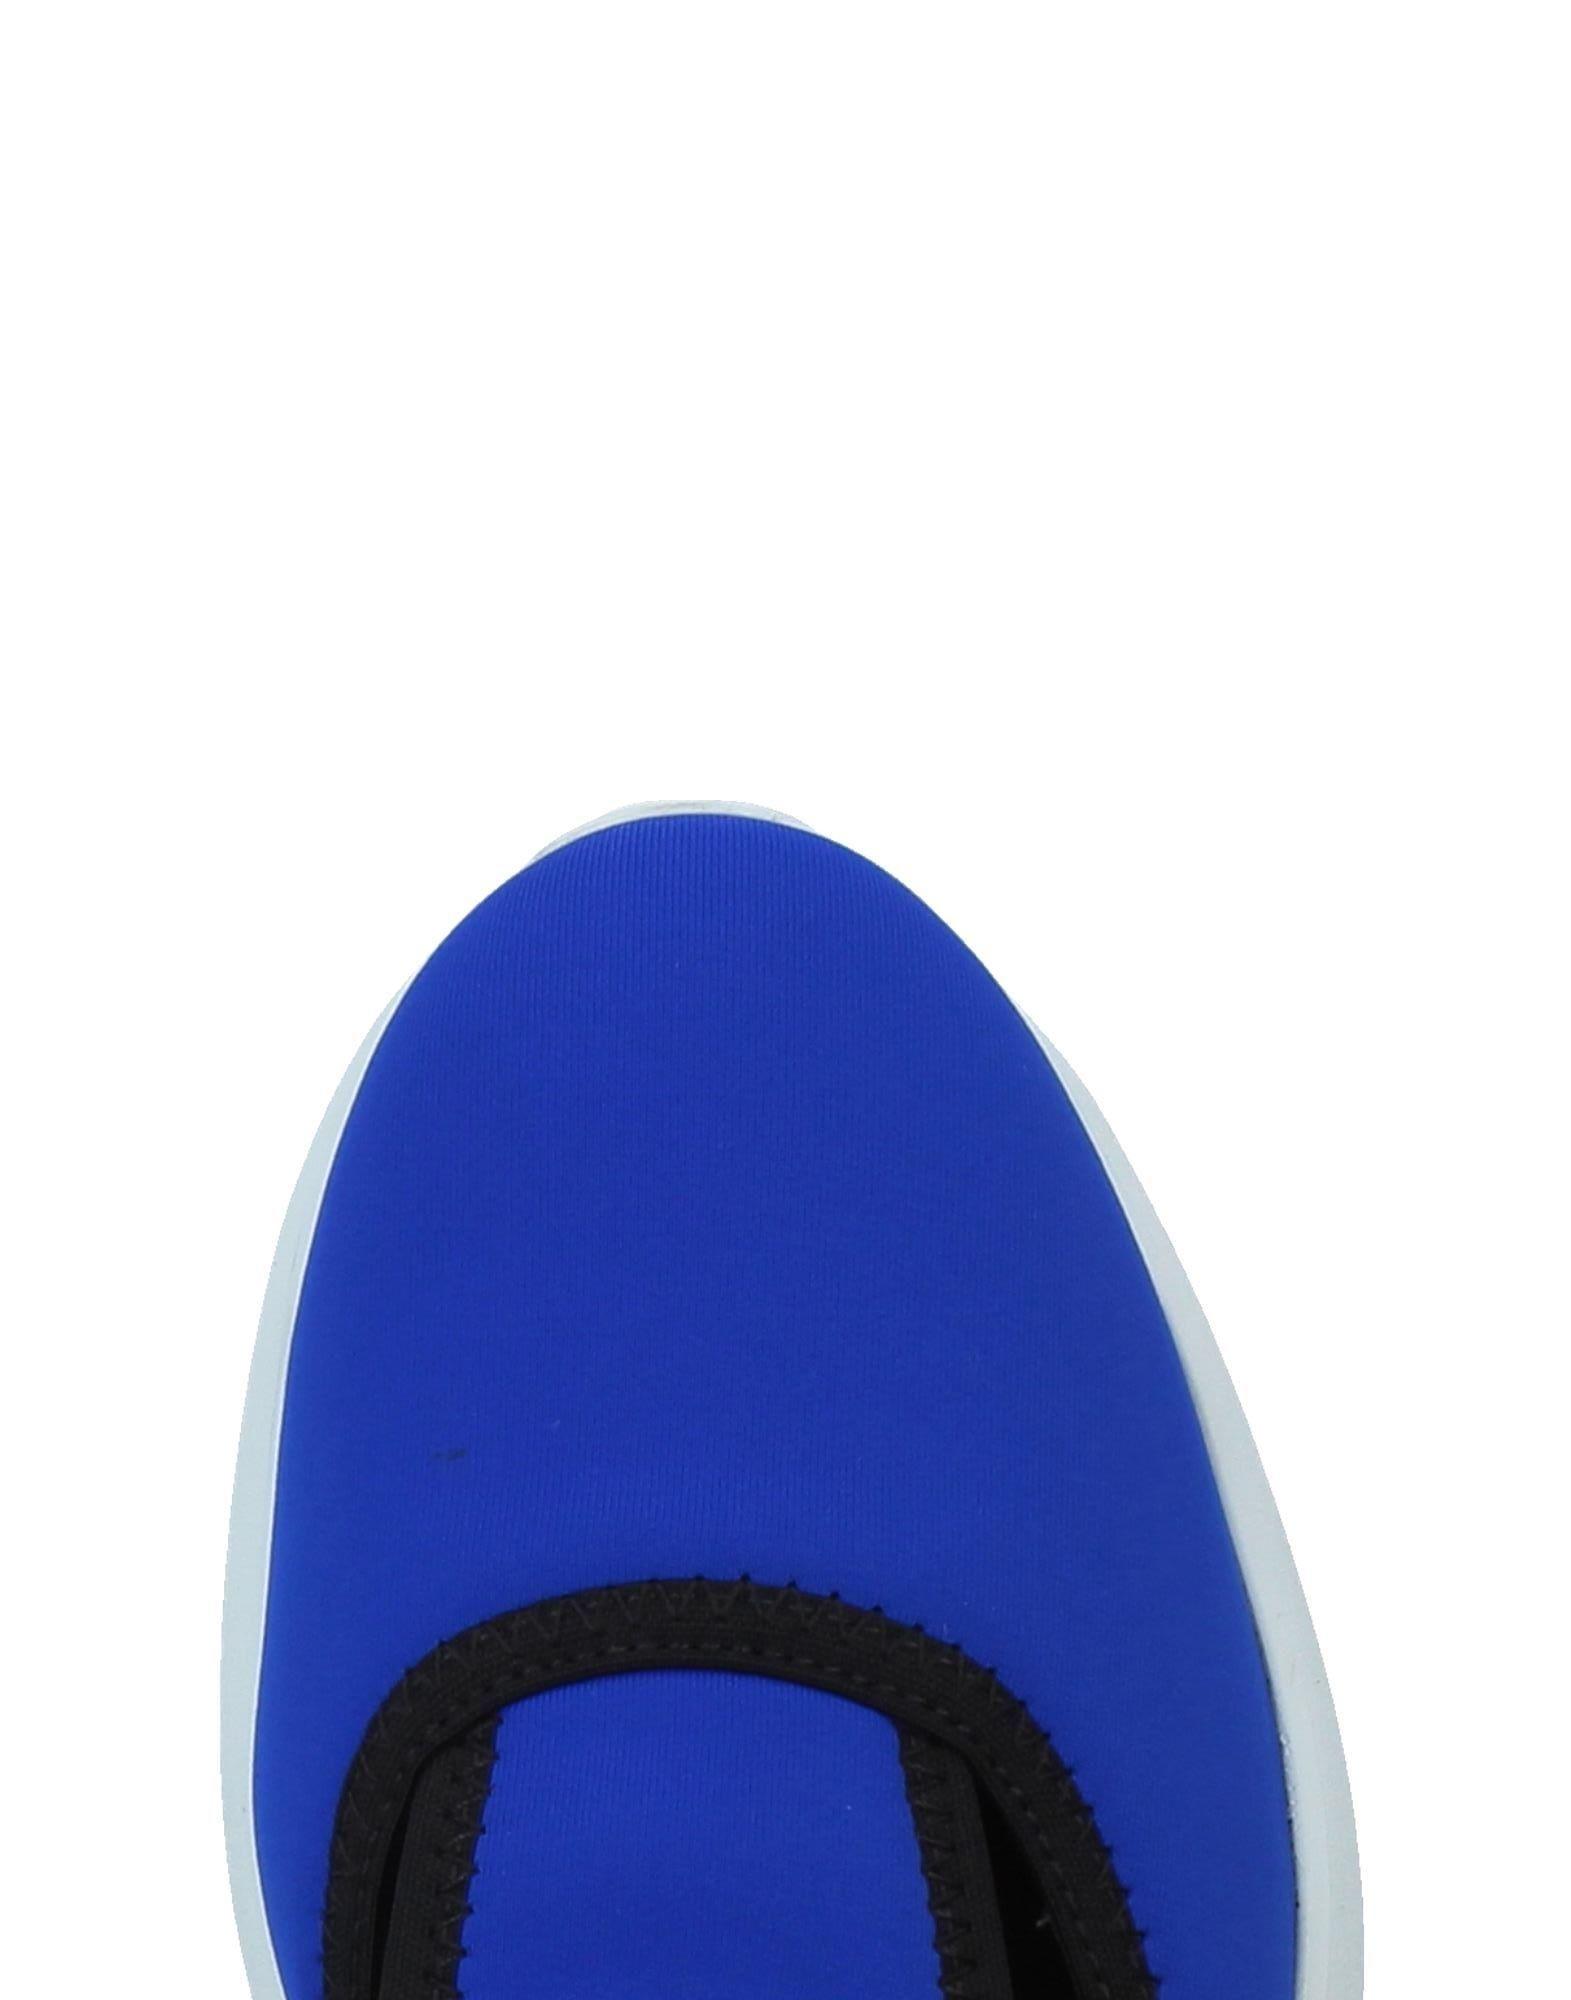 Msgm Sneakers Damen  11380660OE Gute Qualität beliebte Schuhe